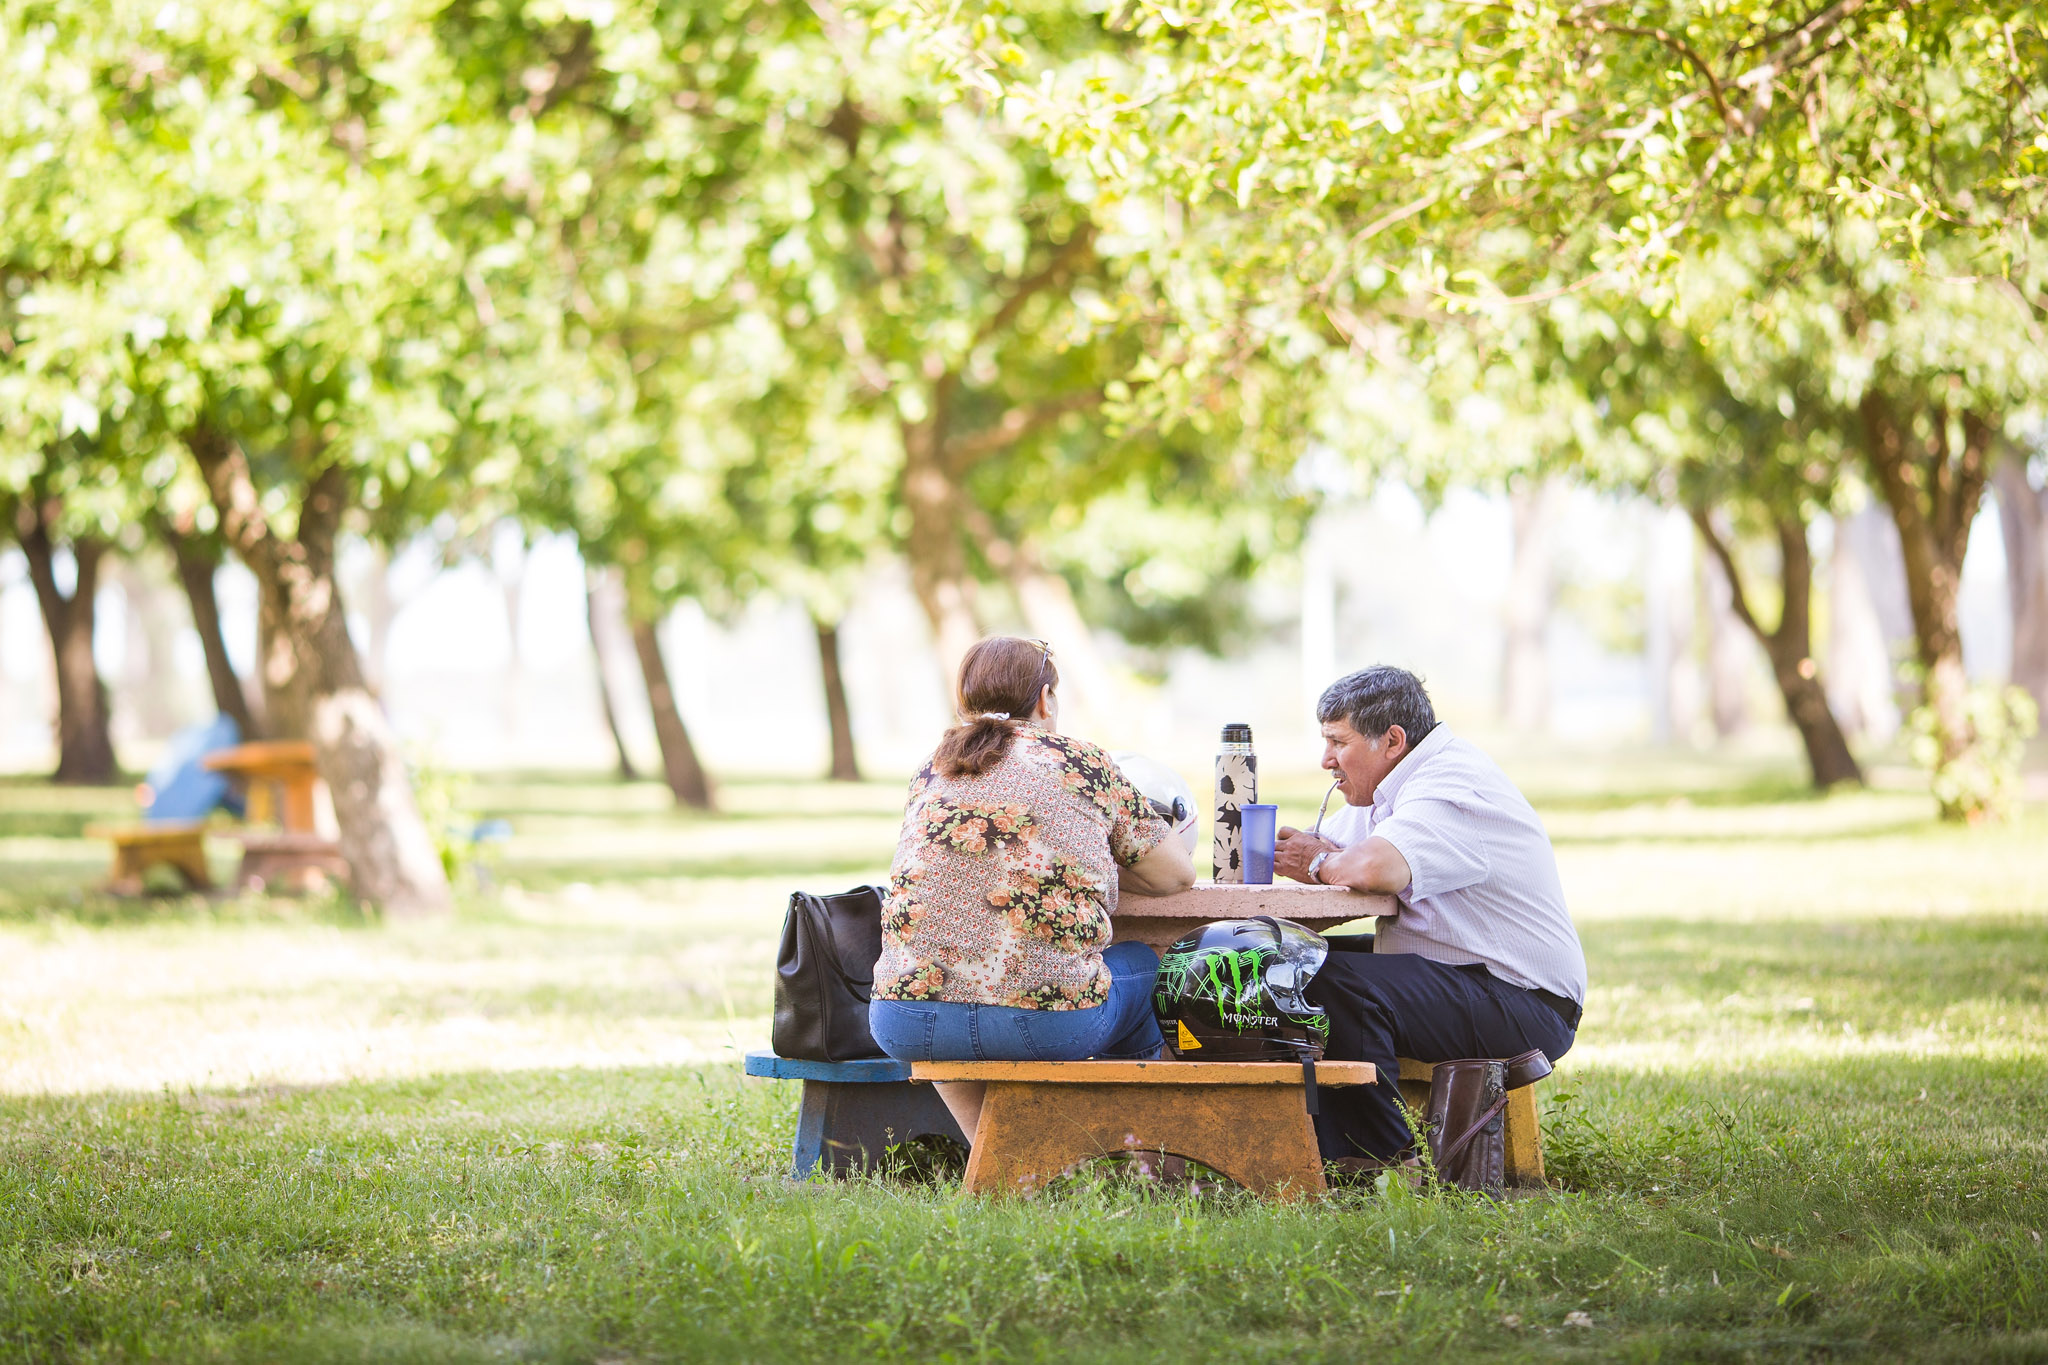 wedding-travellers-destination-photography-overlanding-south-america-uruguay-mercedes-matte-drinking-chill-relax-park-tea